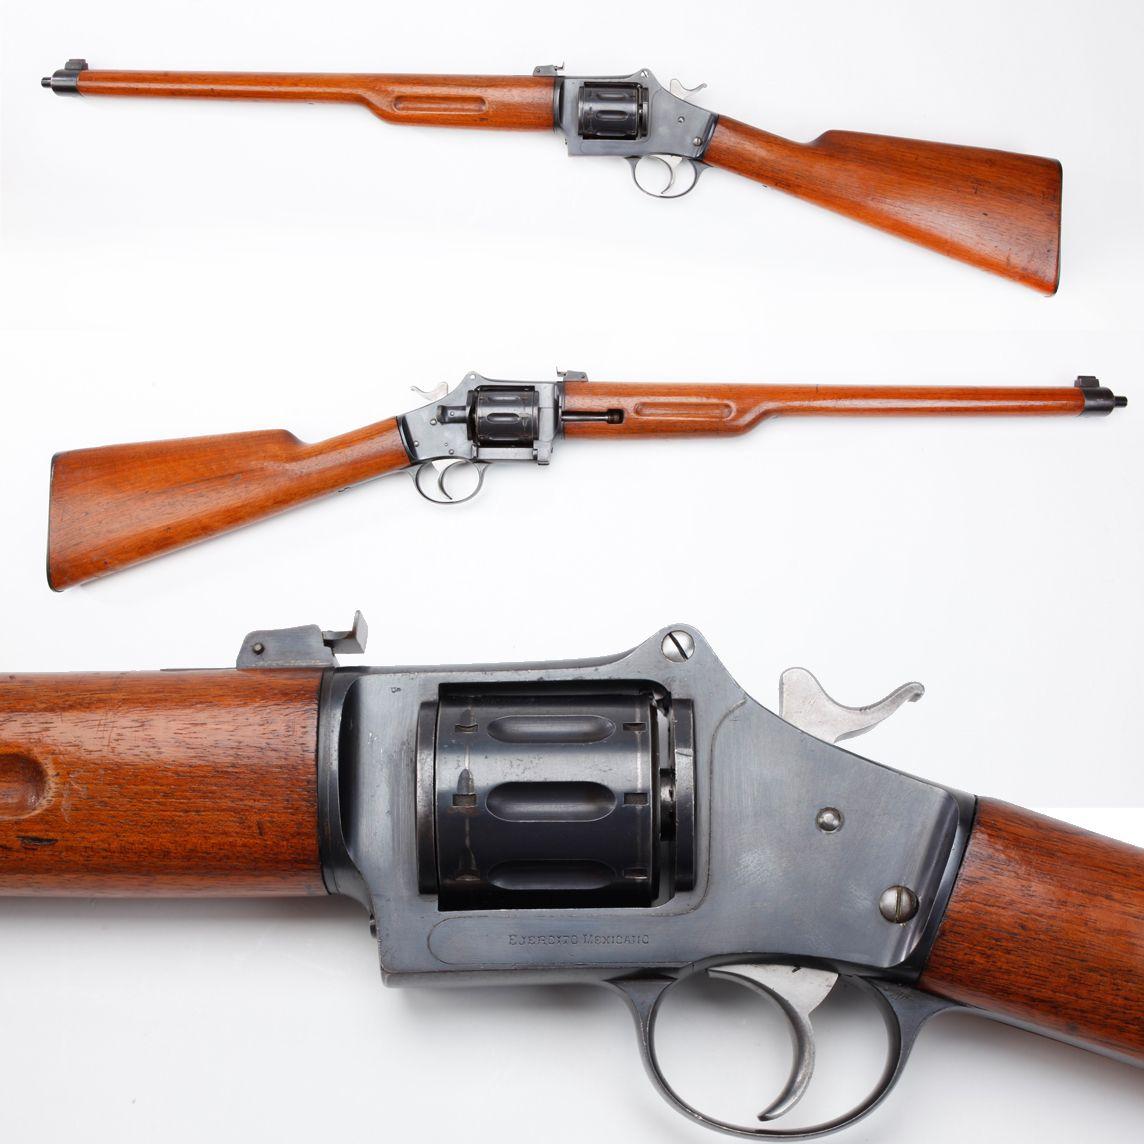 Pieper Revolving Rifle Belgian Pieper revolving rifle